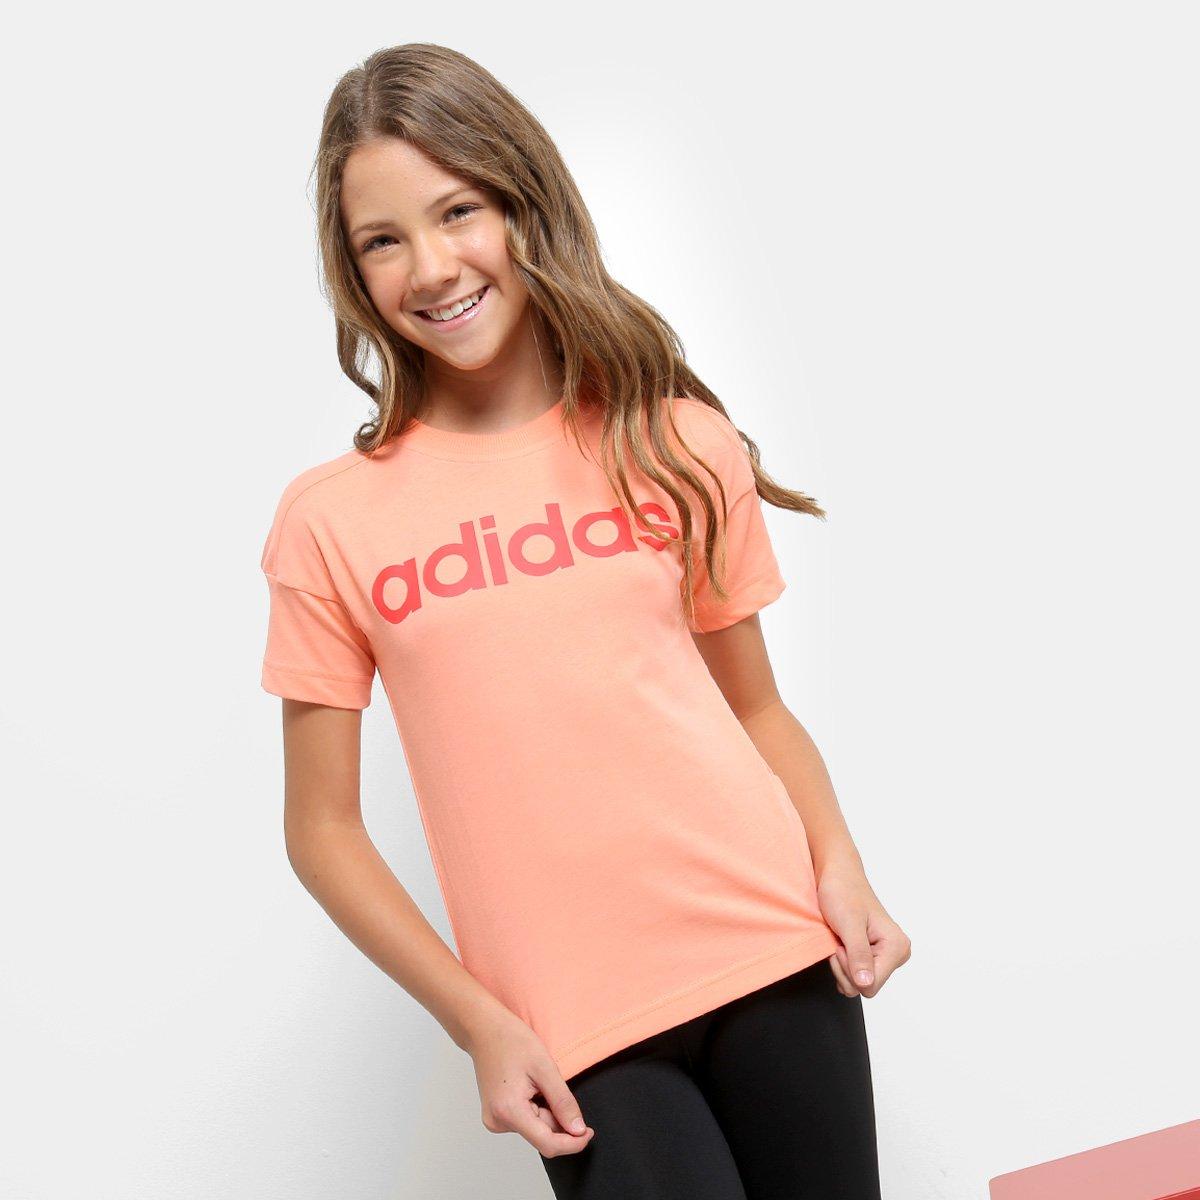 Camiseta Infantil Camiseta Lin Adidas Adidas Salmão Lk Lin Lk Lk Camiseta Infantil Adidas Lin Salmão Infantil Salmão xEAwq1P